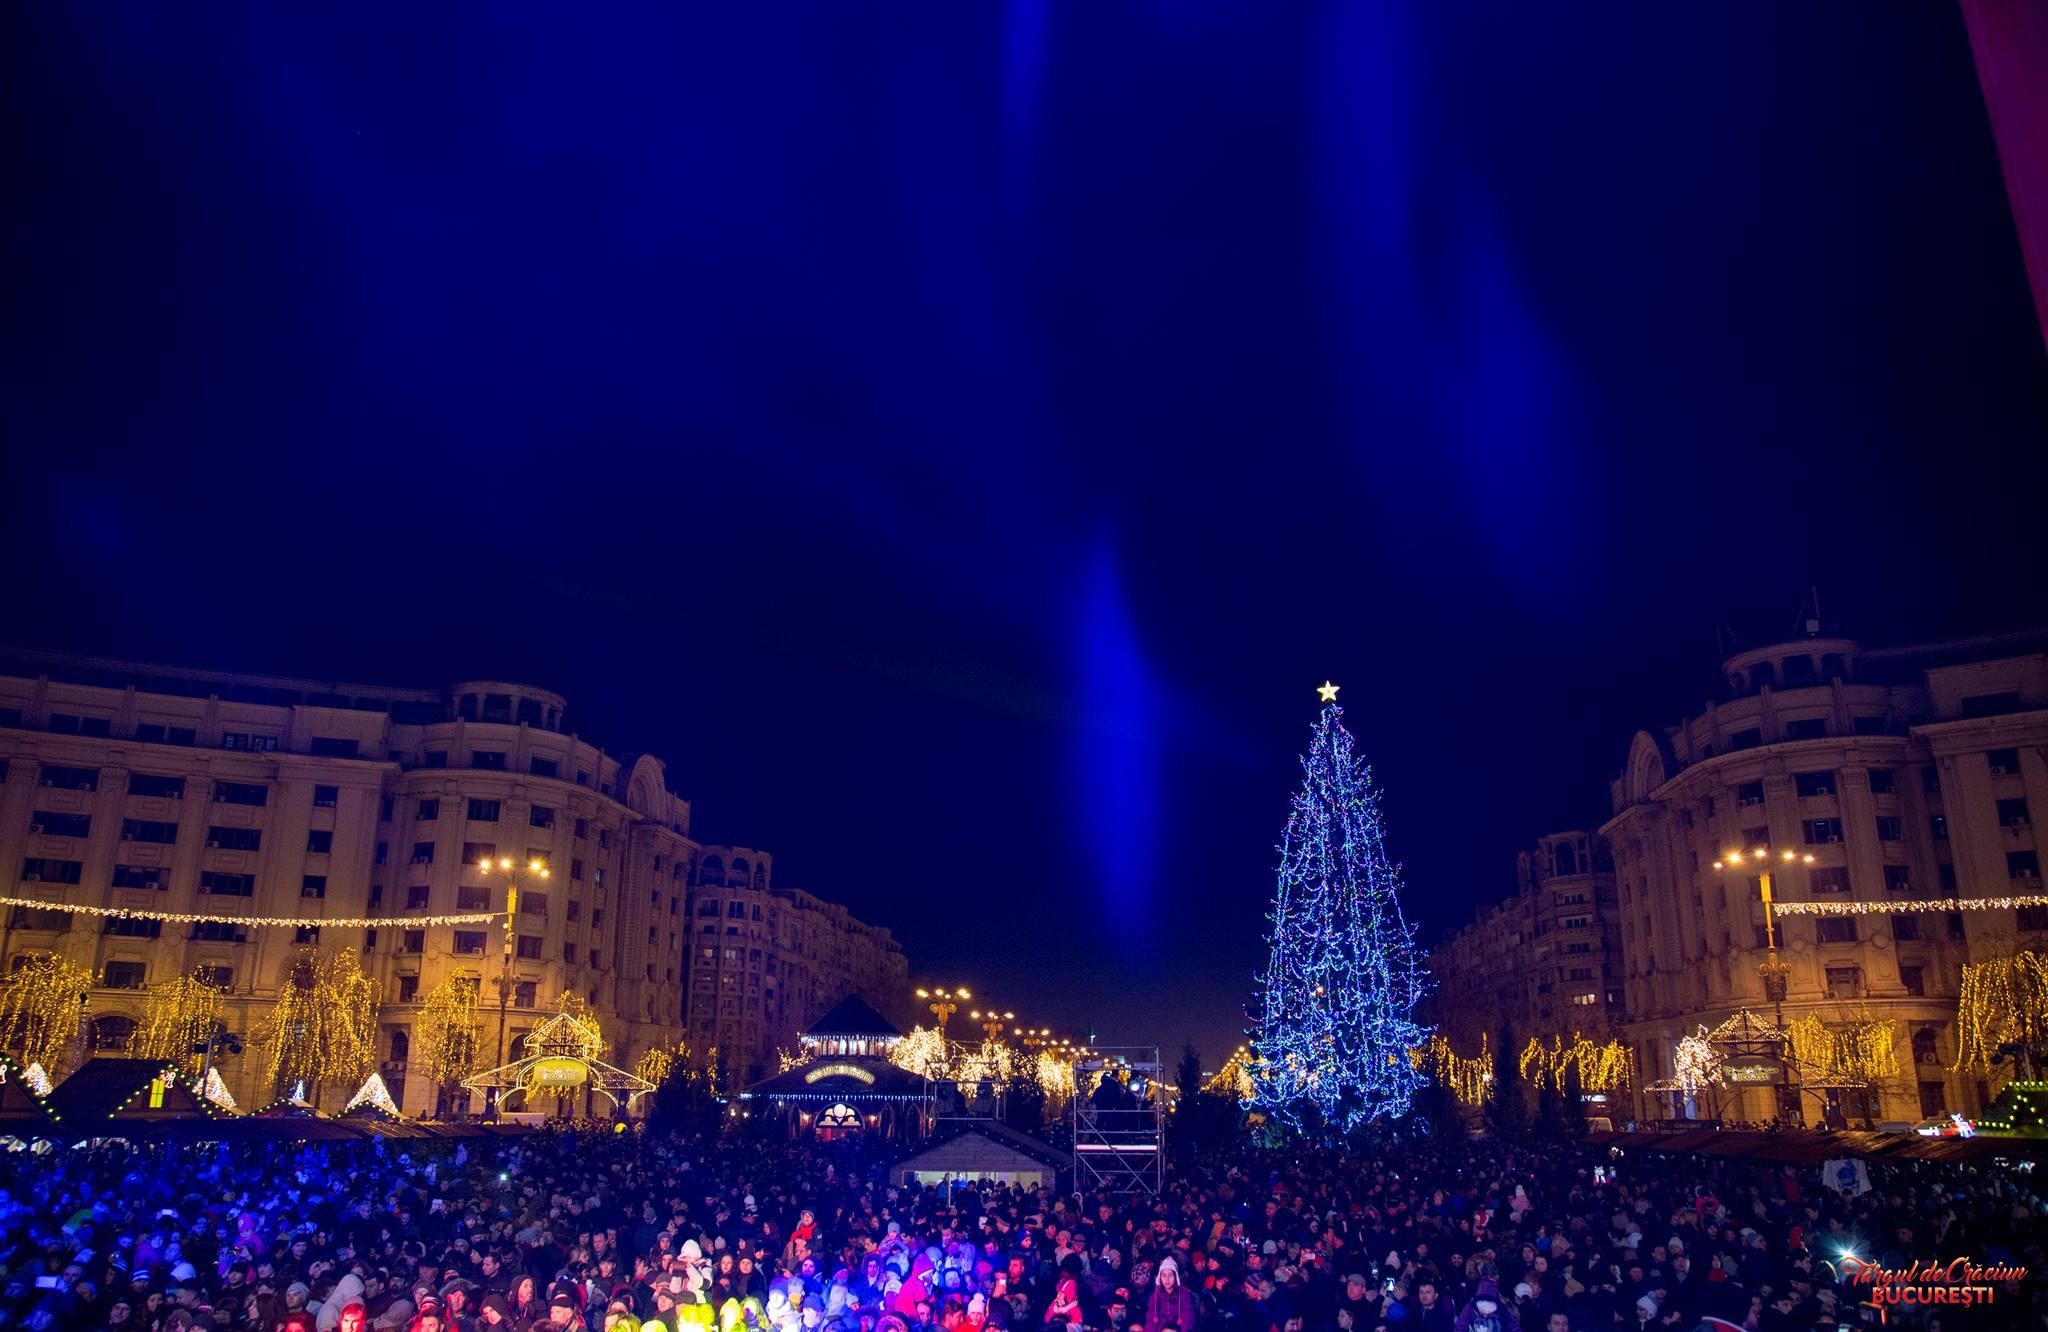 Donati jucarii si carti pentru copiii nevoiasi in Piata Constitutiei, la Bucharest Christmas Market!